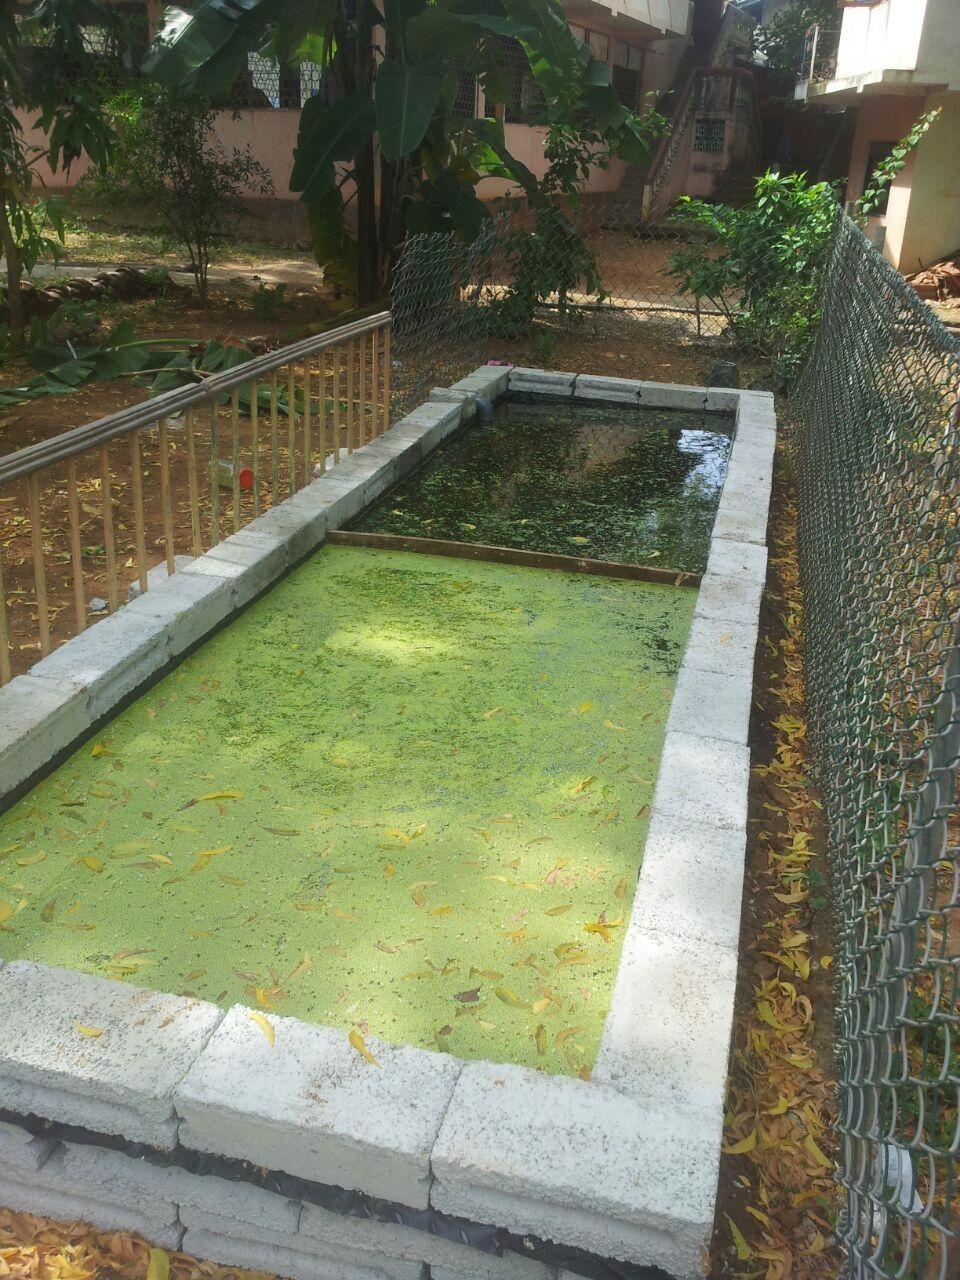 bioreactor prototype in melbourne florida duckweed growth